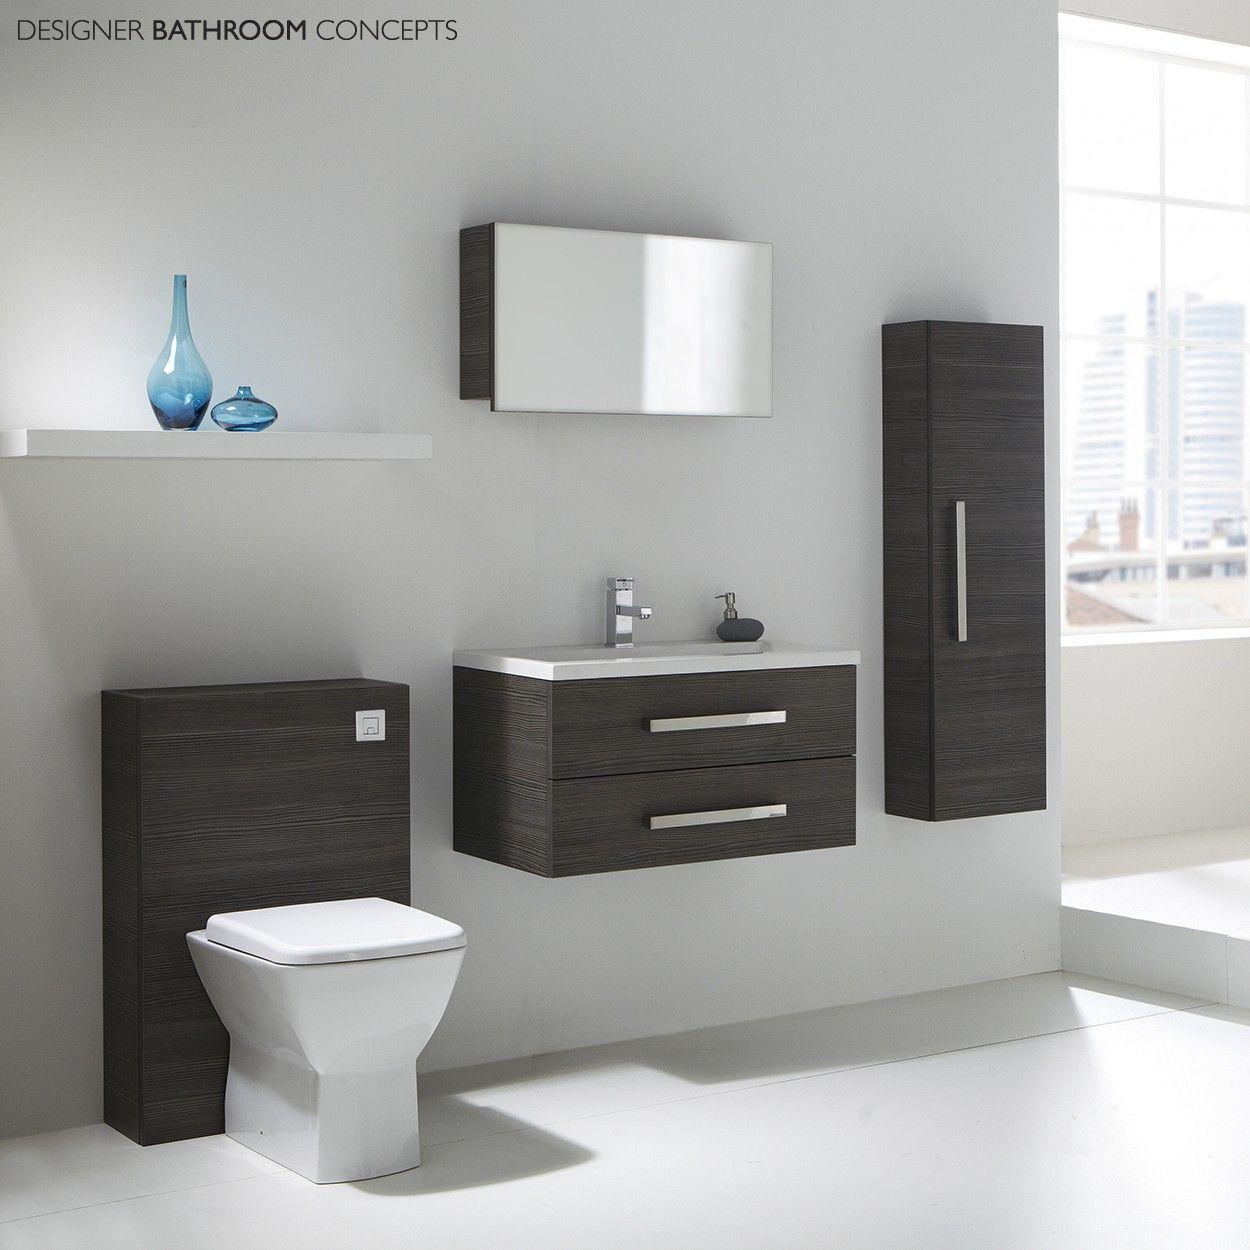 Aquatrend Designer Modular Bathroom Furniture Collection Bathroom Furniture Black Bathroom Furniture Modular